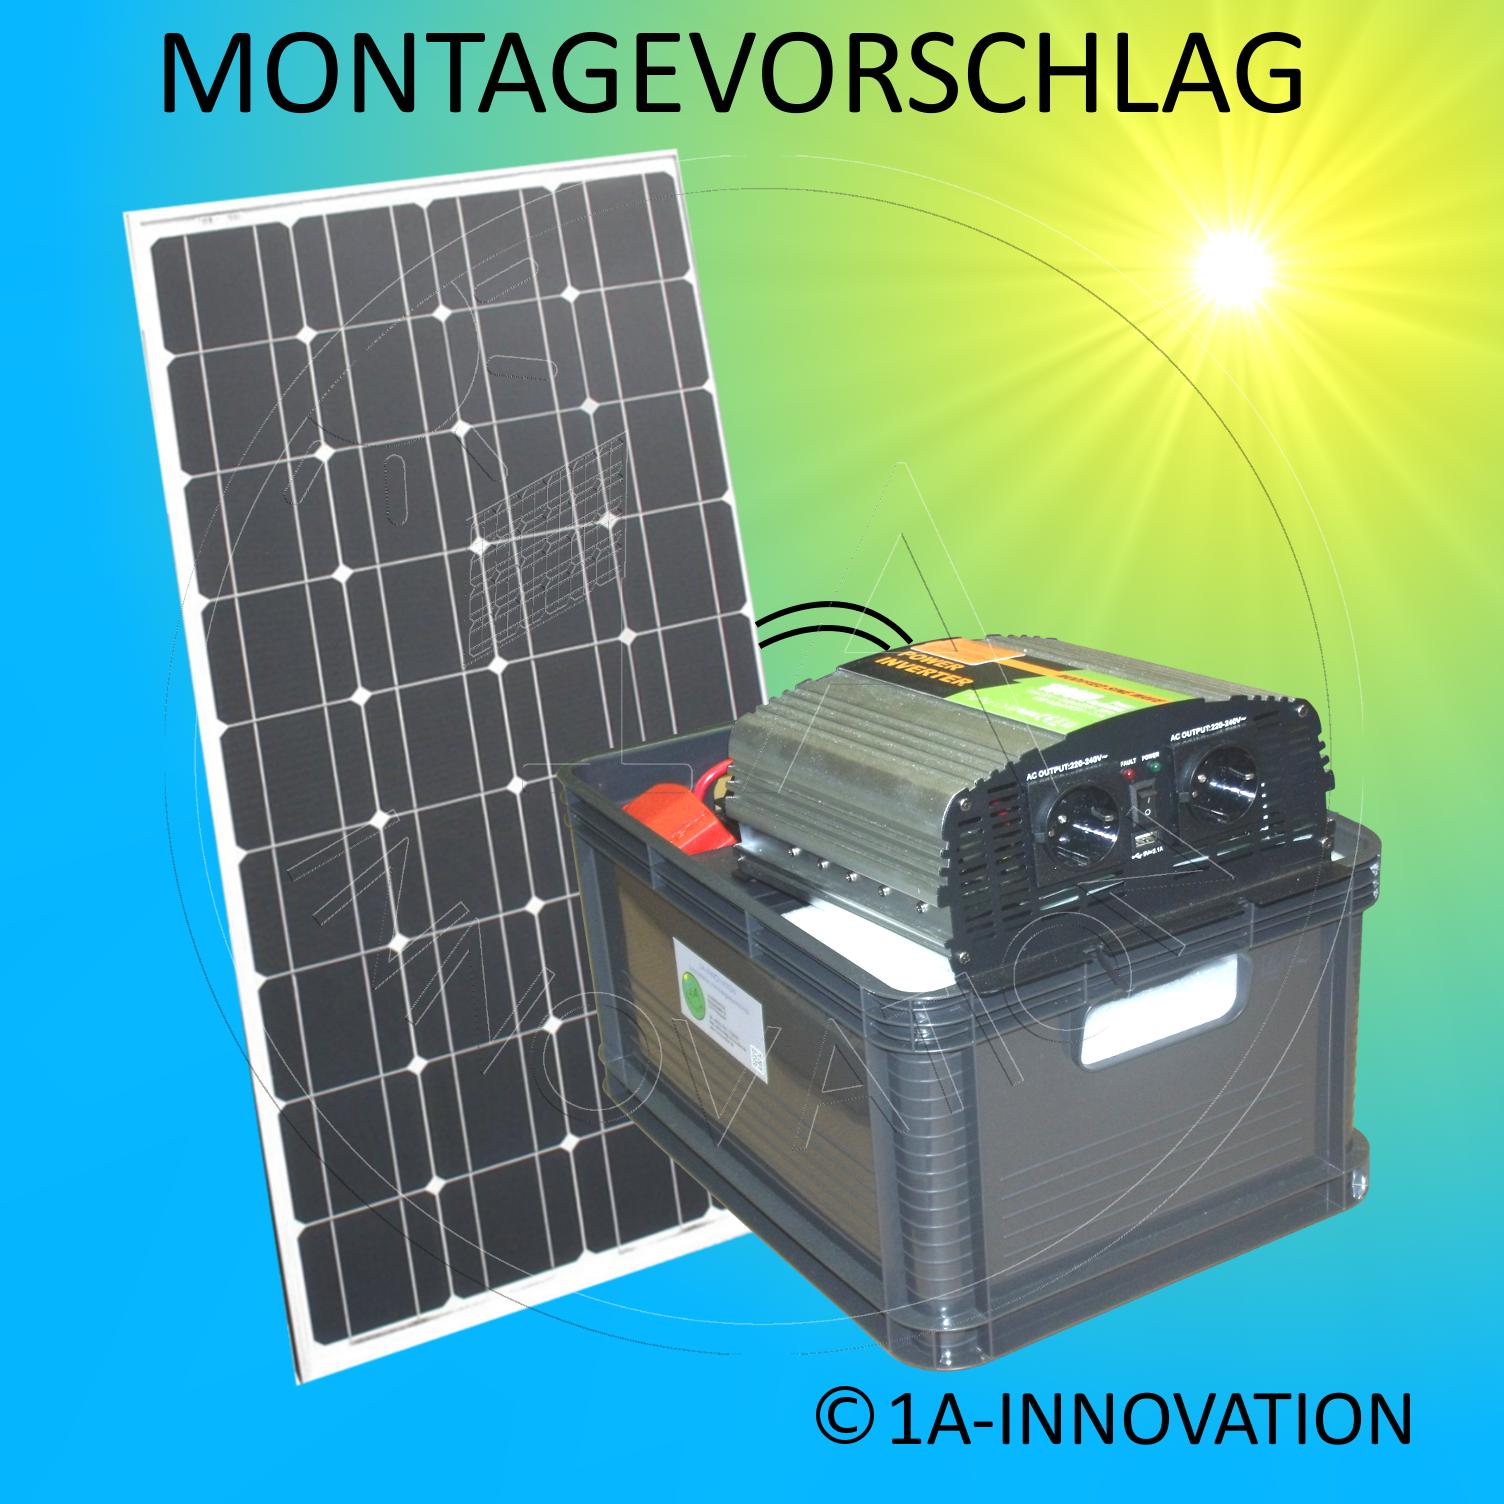 Solarenergie 1000w Solaranlage Komplettpaket 220v 4x Akku 280ah Solarpanel 2000w Watt 24v